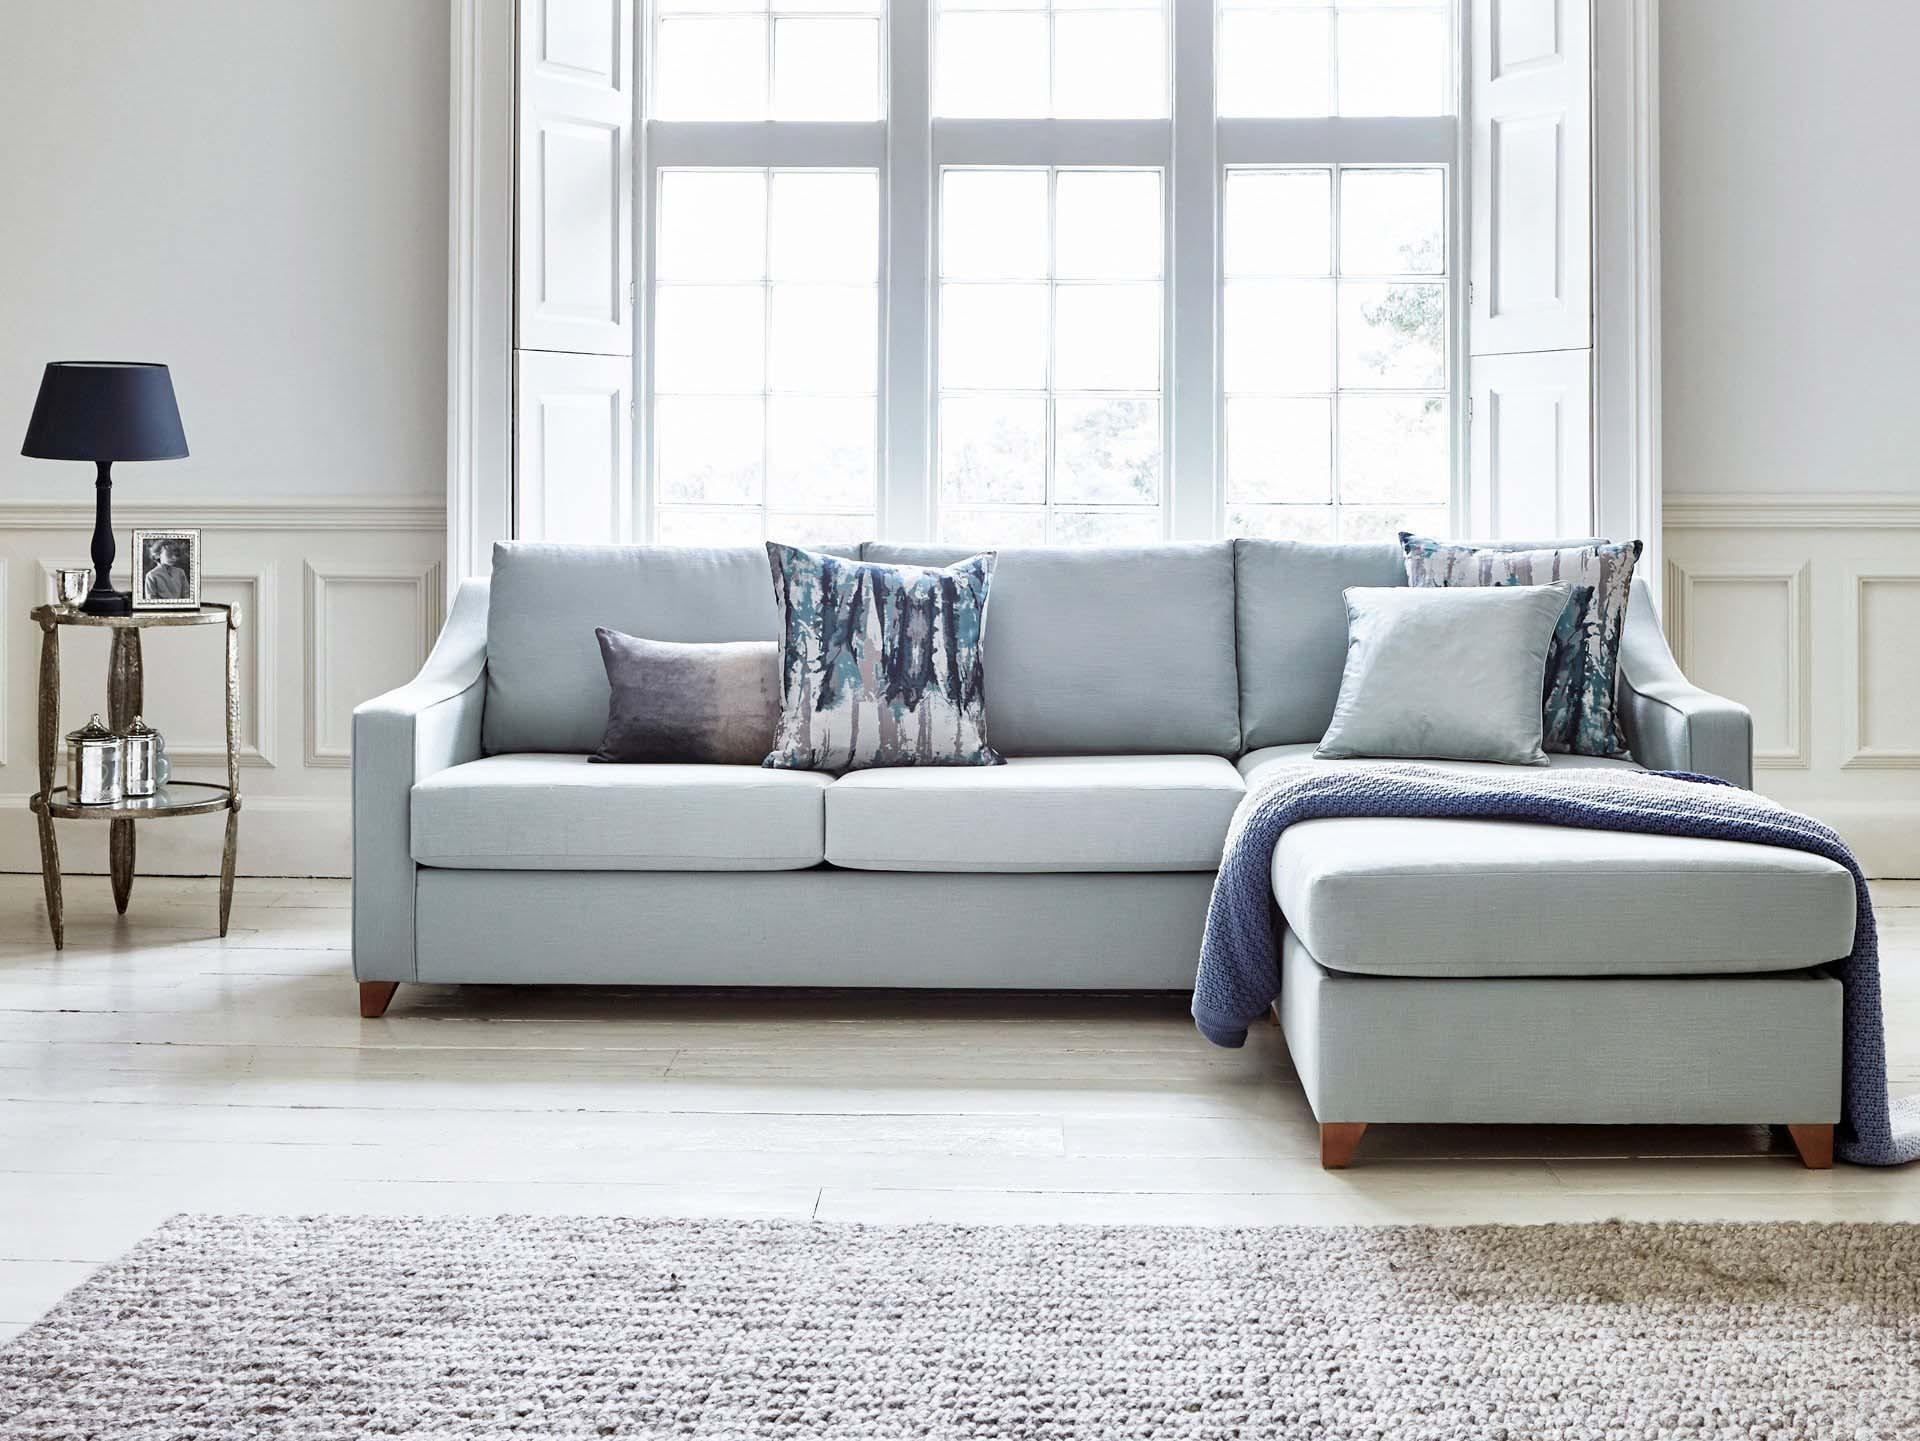 Luxury sofa beds with storage